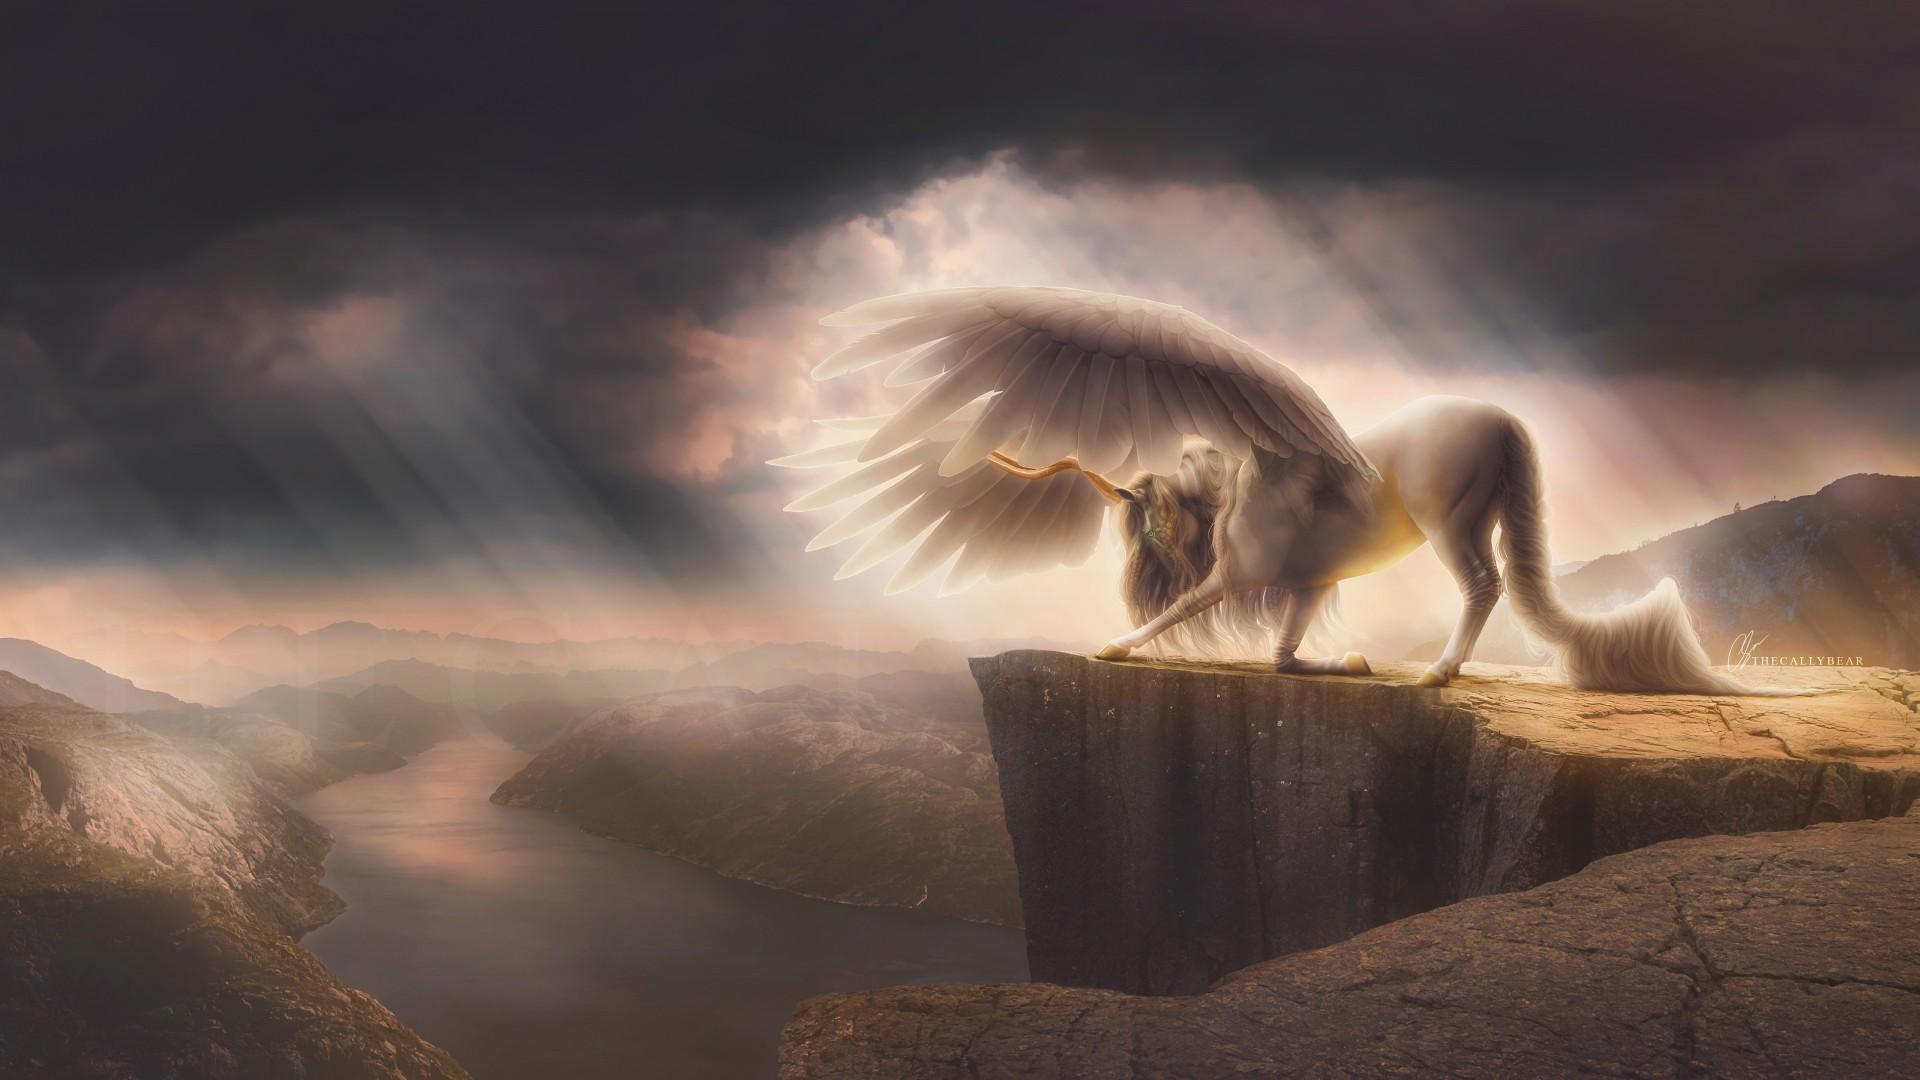 Dmt Wallpaper Hd Fantasy Pegasus Horse 4k Wallpapers Hd Wallpapers Id